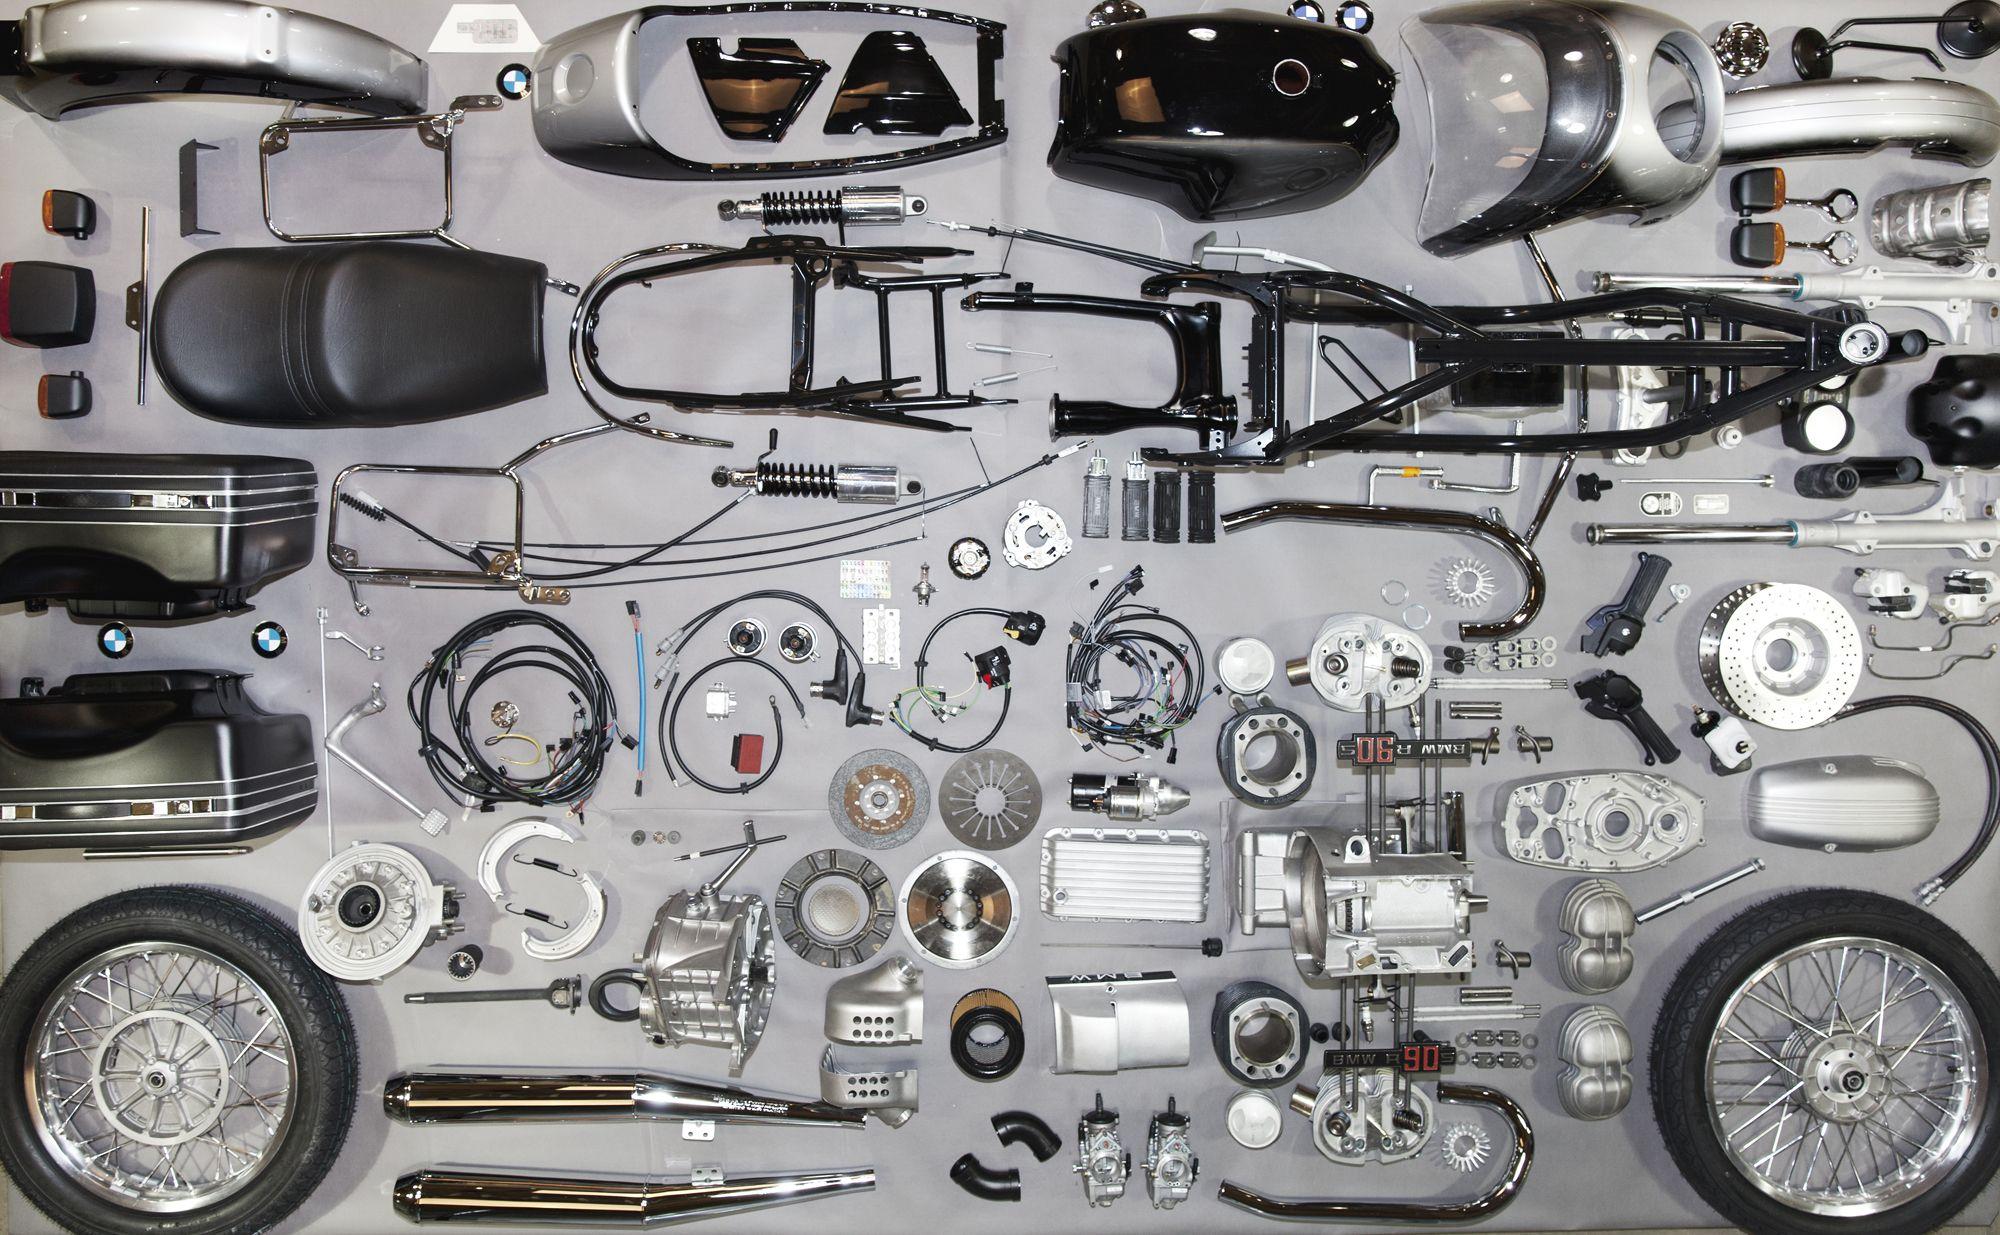 light switch harness bmw diagram free ucav wiring engine trailer